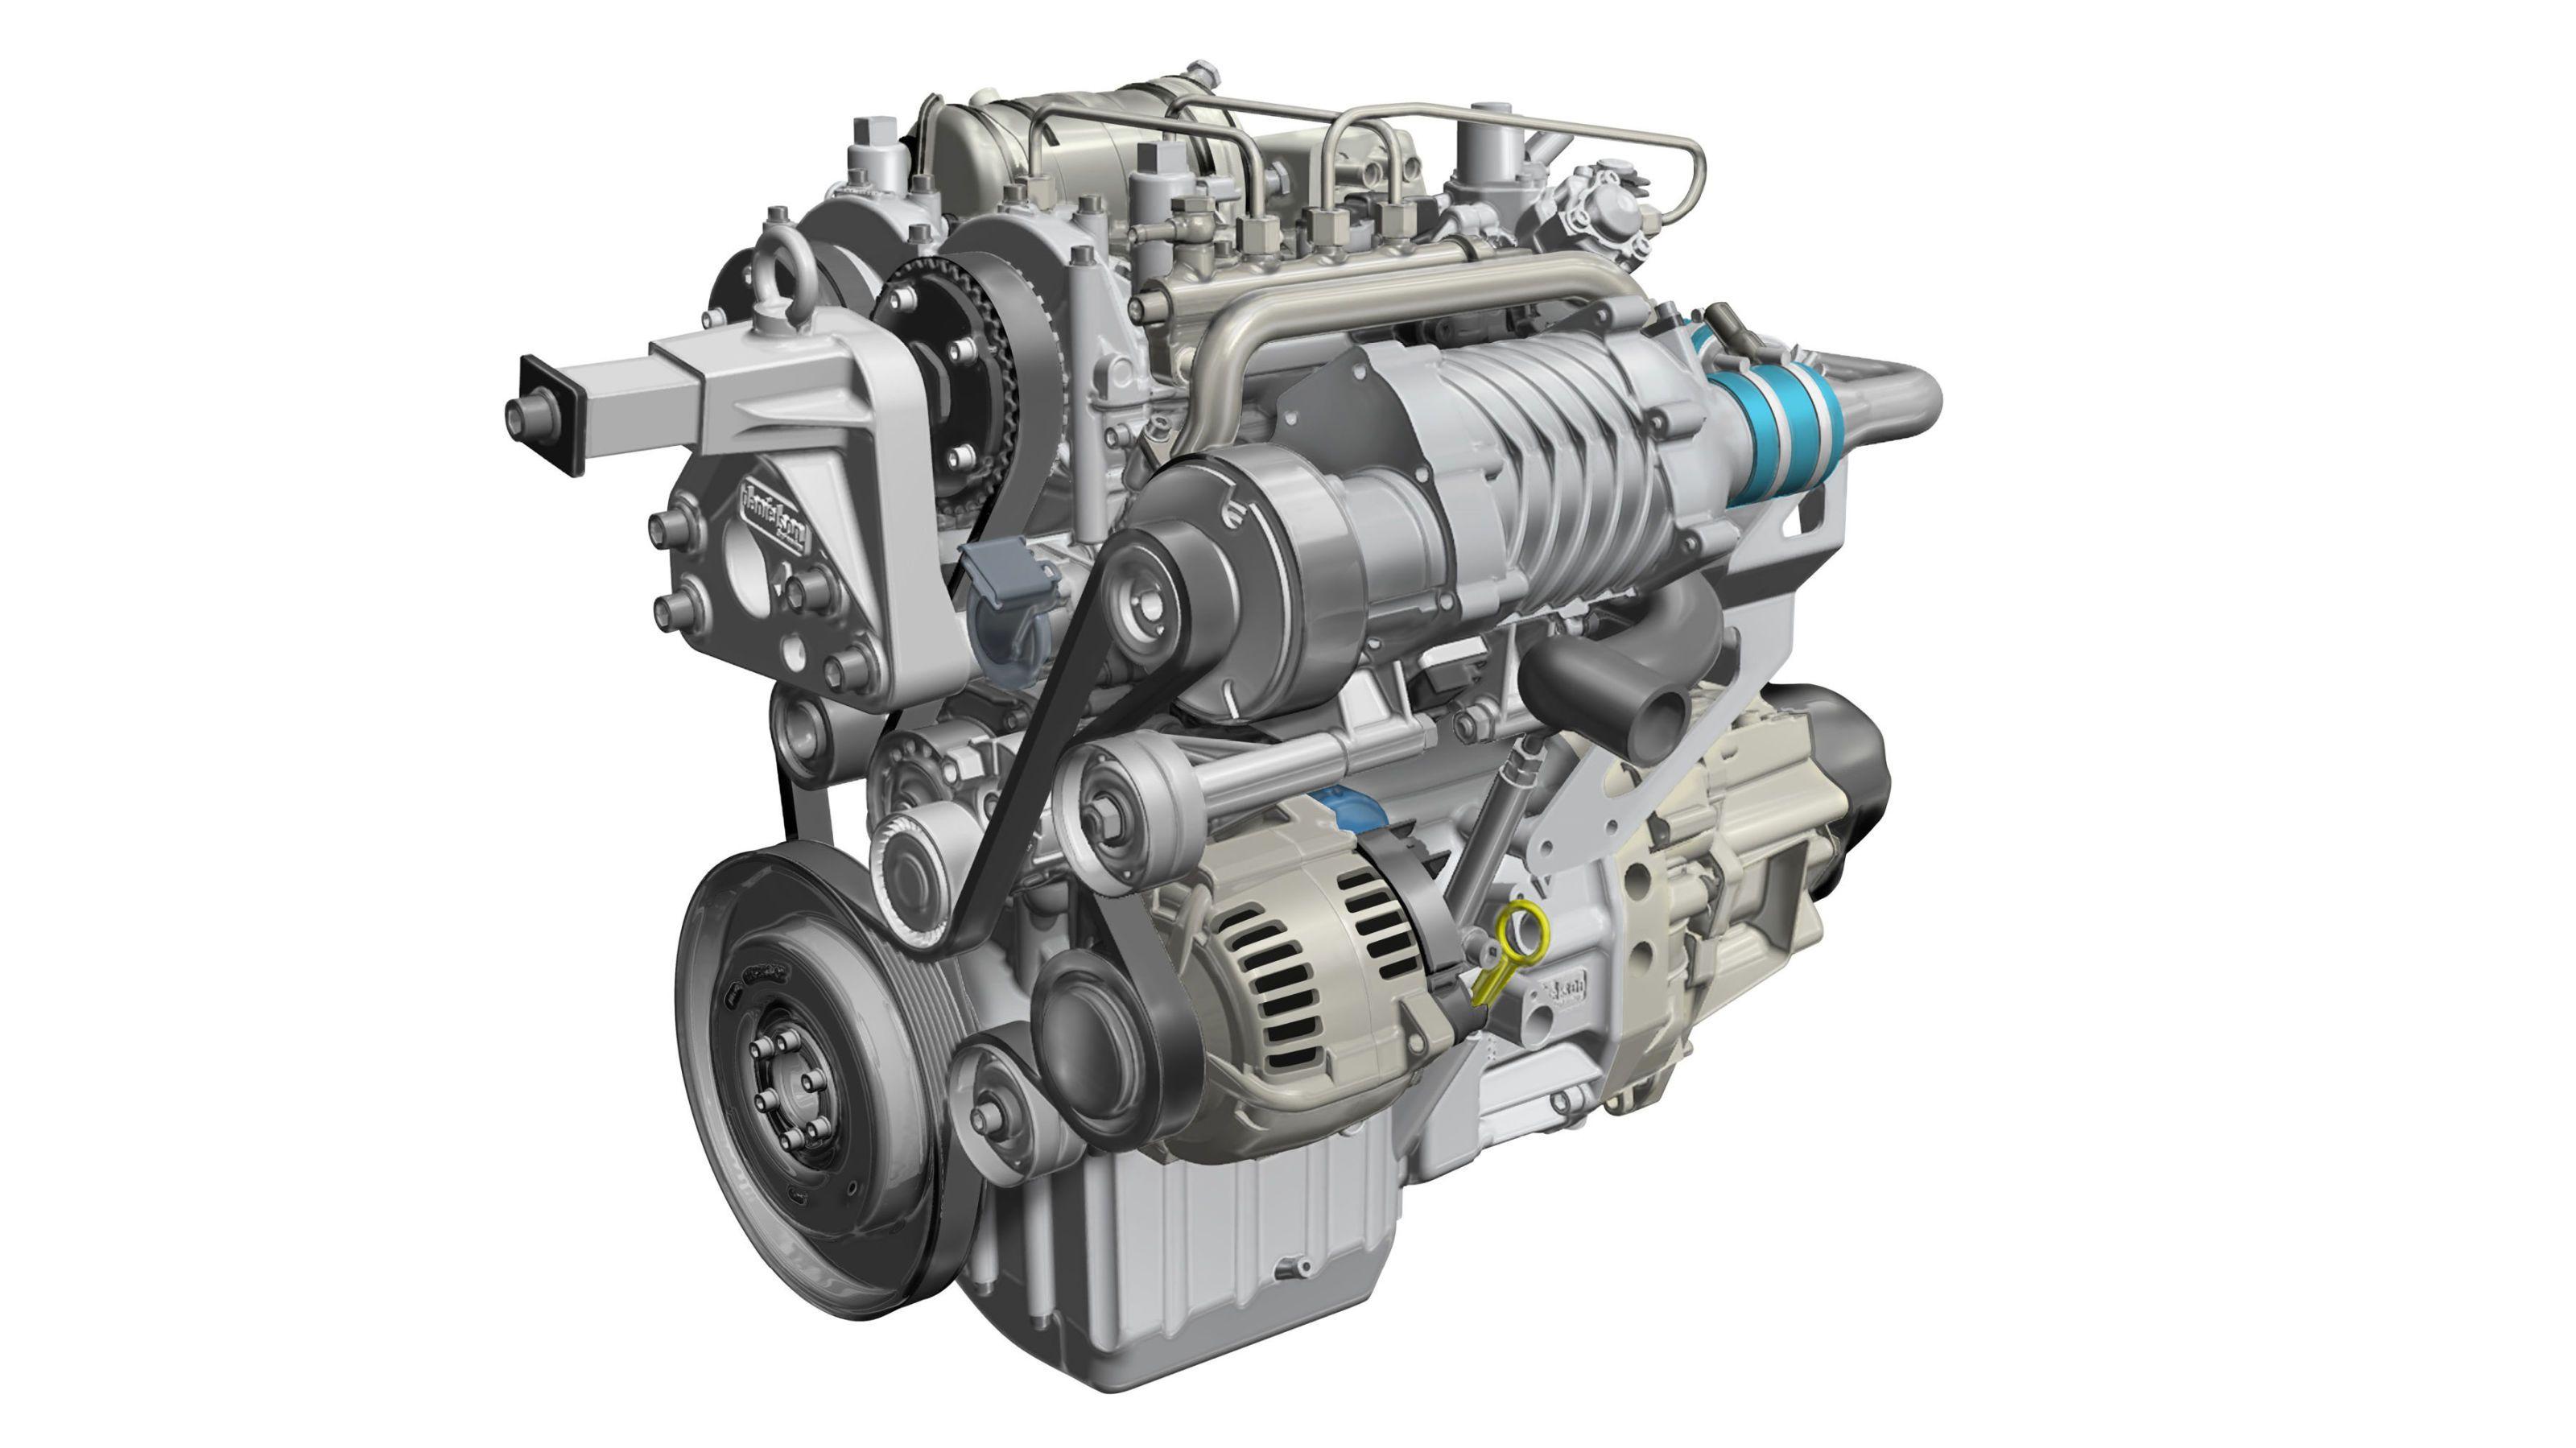 Modern 2 Stroke Engines Two Diesel Engine Diagram Marinediesels Co Uk The Crosshead Hydraulic Rh Info Motorcycle